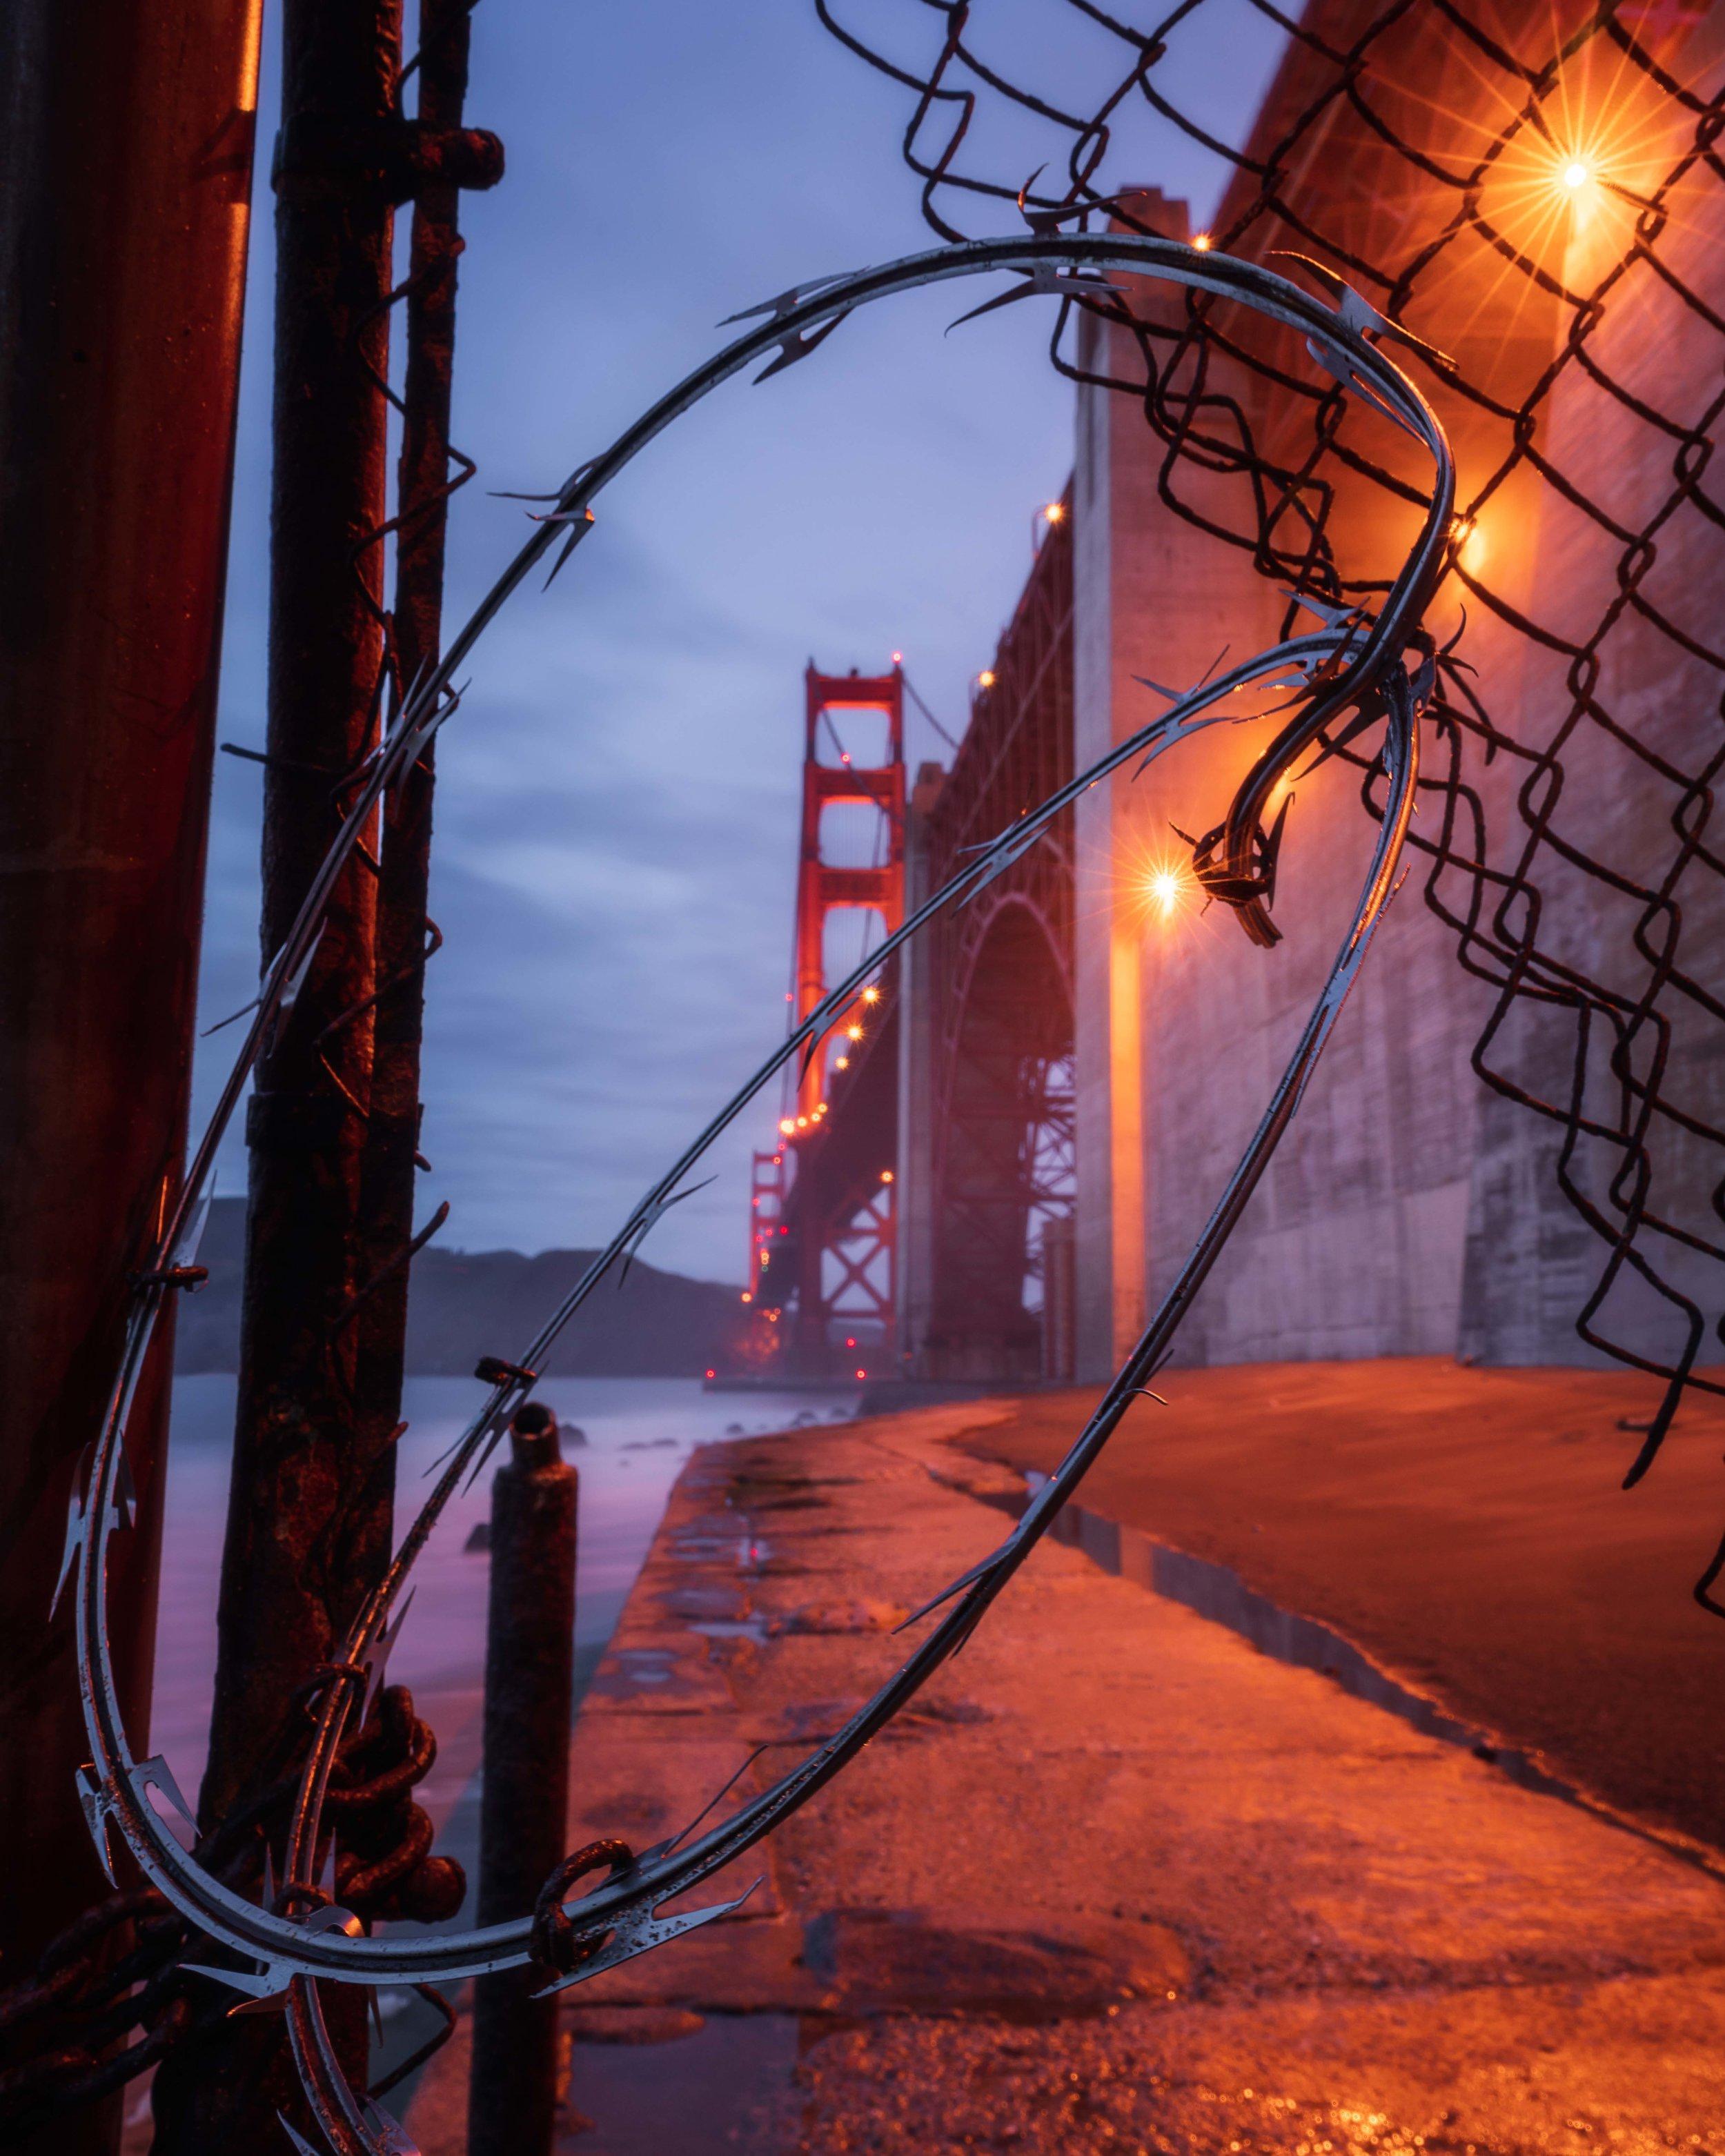 Golden Gate Bridge San Francisco California Sunset Sunrise Golden Hour Blue Hour Beach Barbed Wire Fence